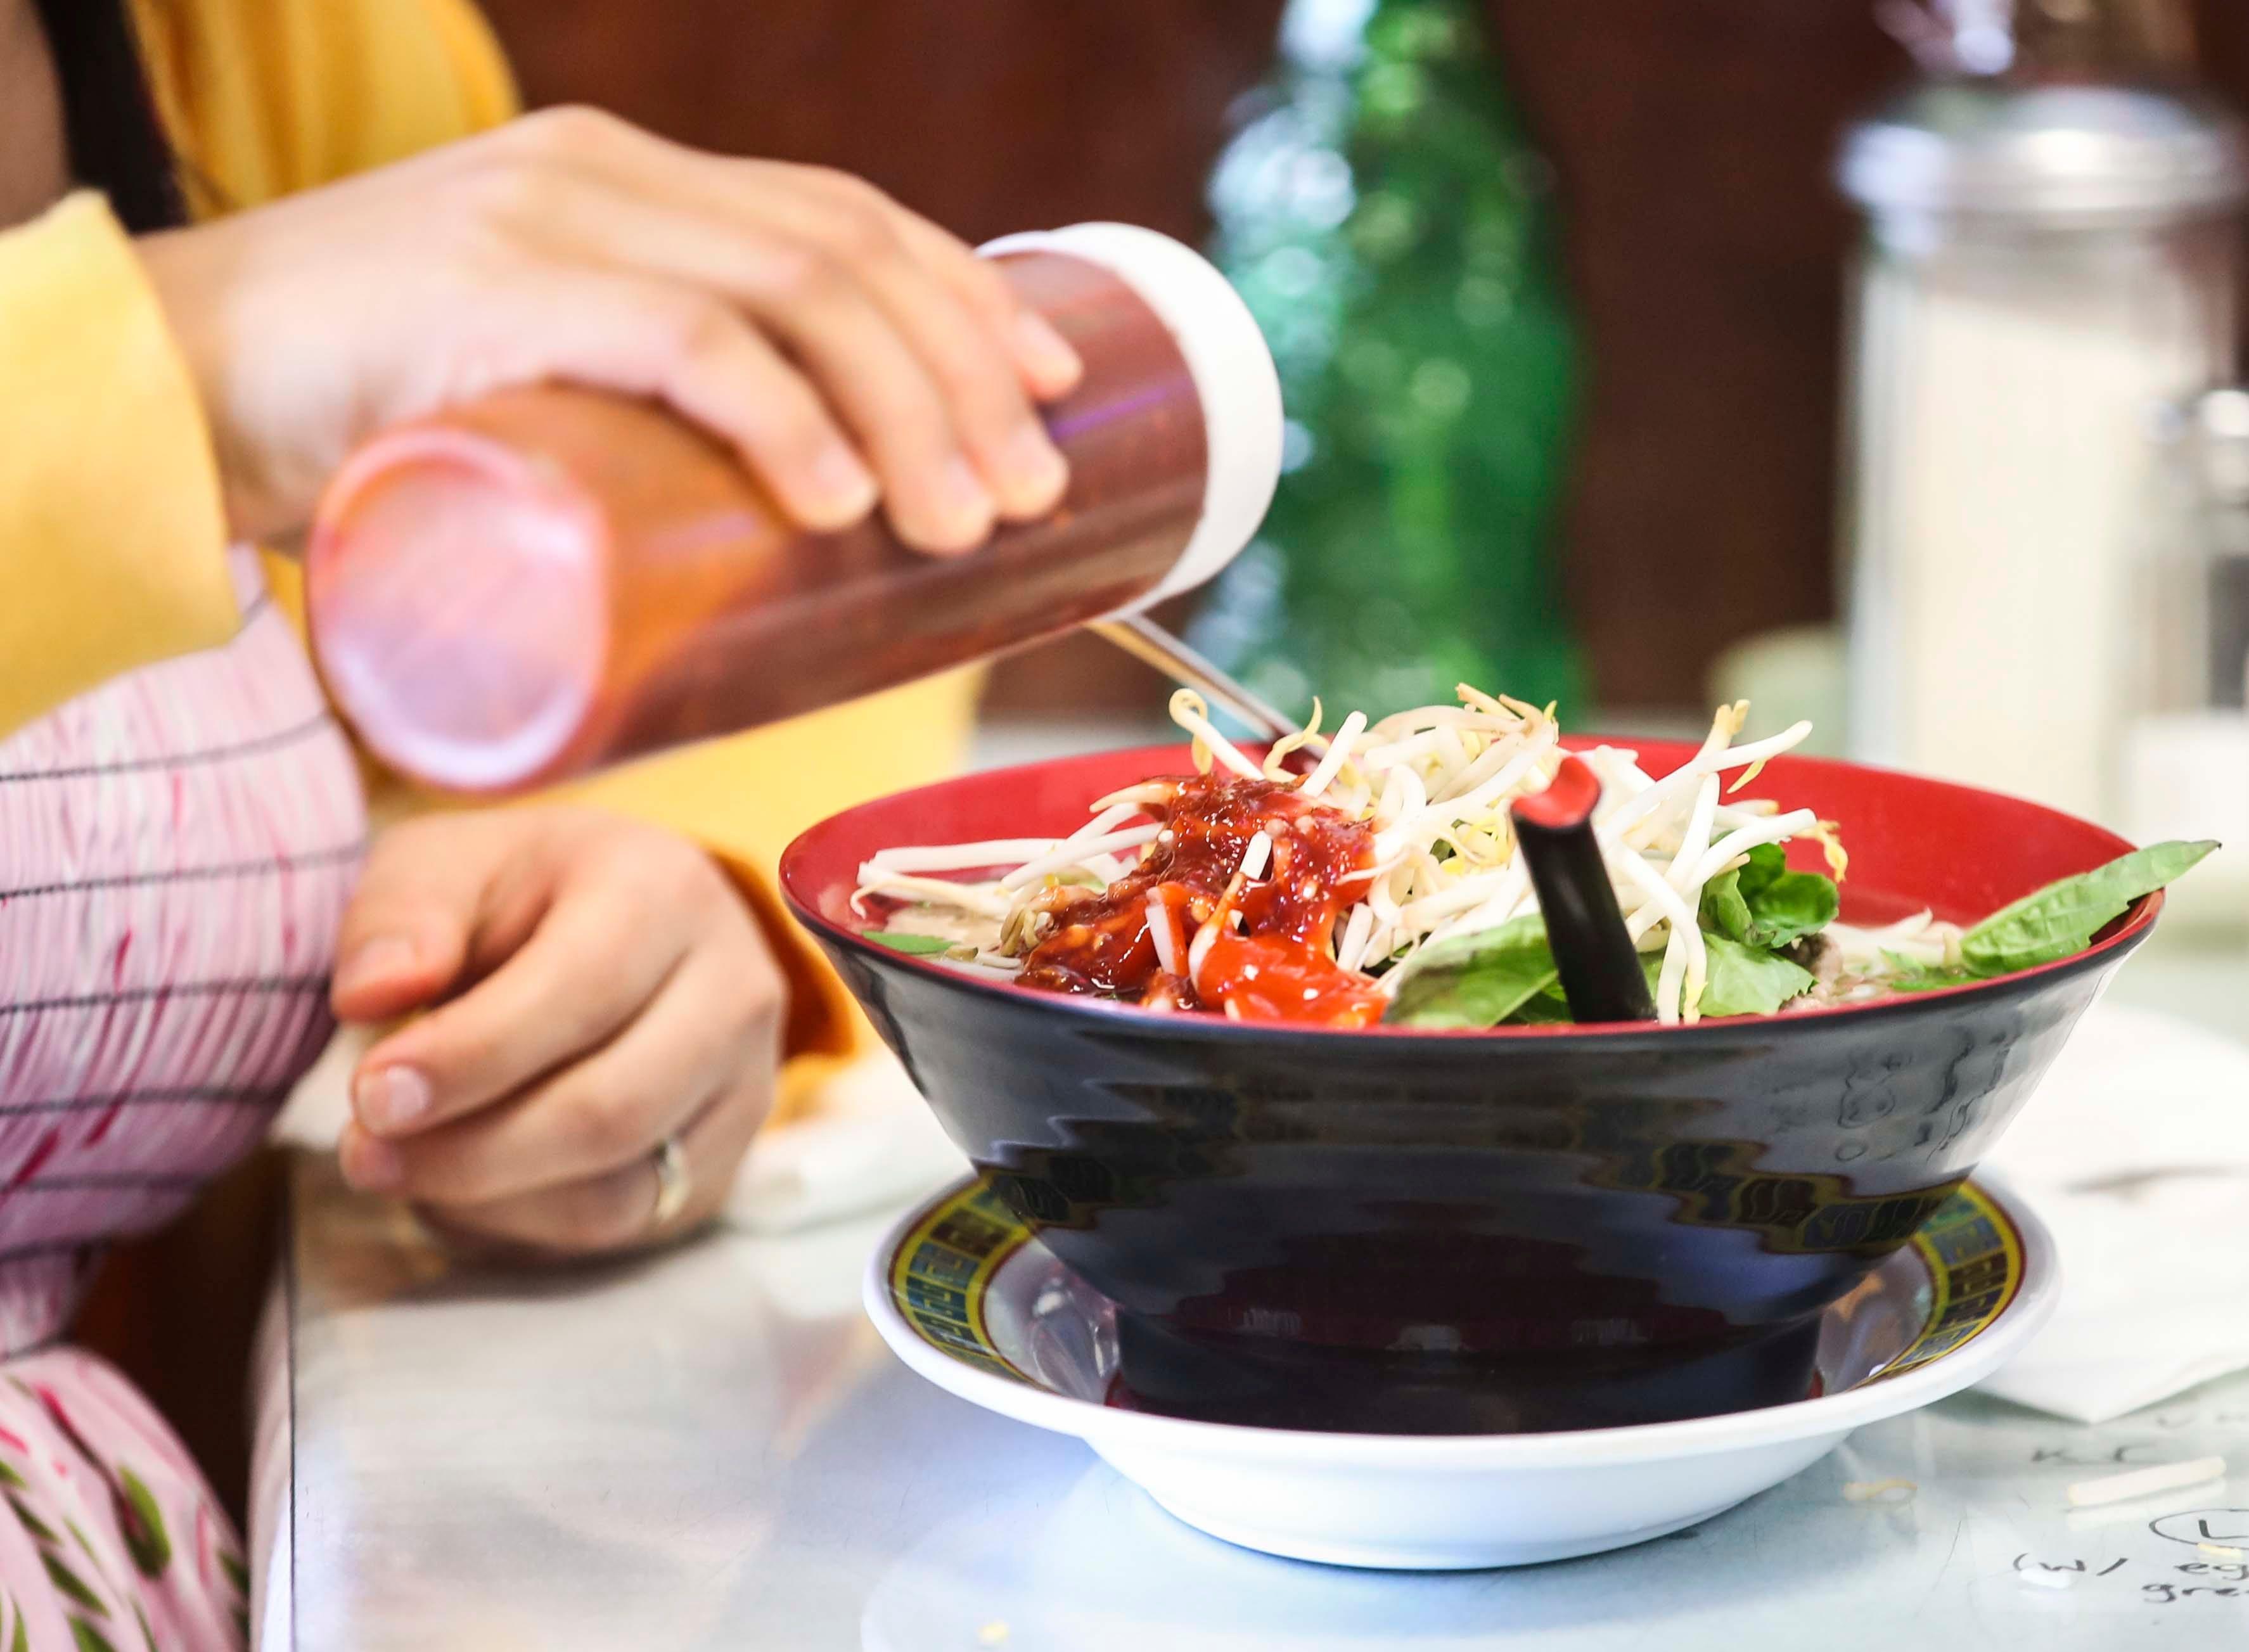 Vietnam Kitchen Restaurant In Louisville S South End Up For Sale